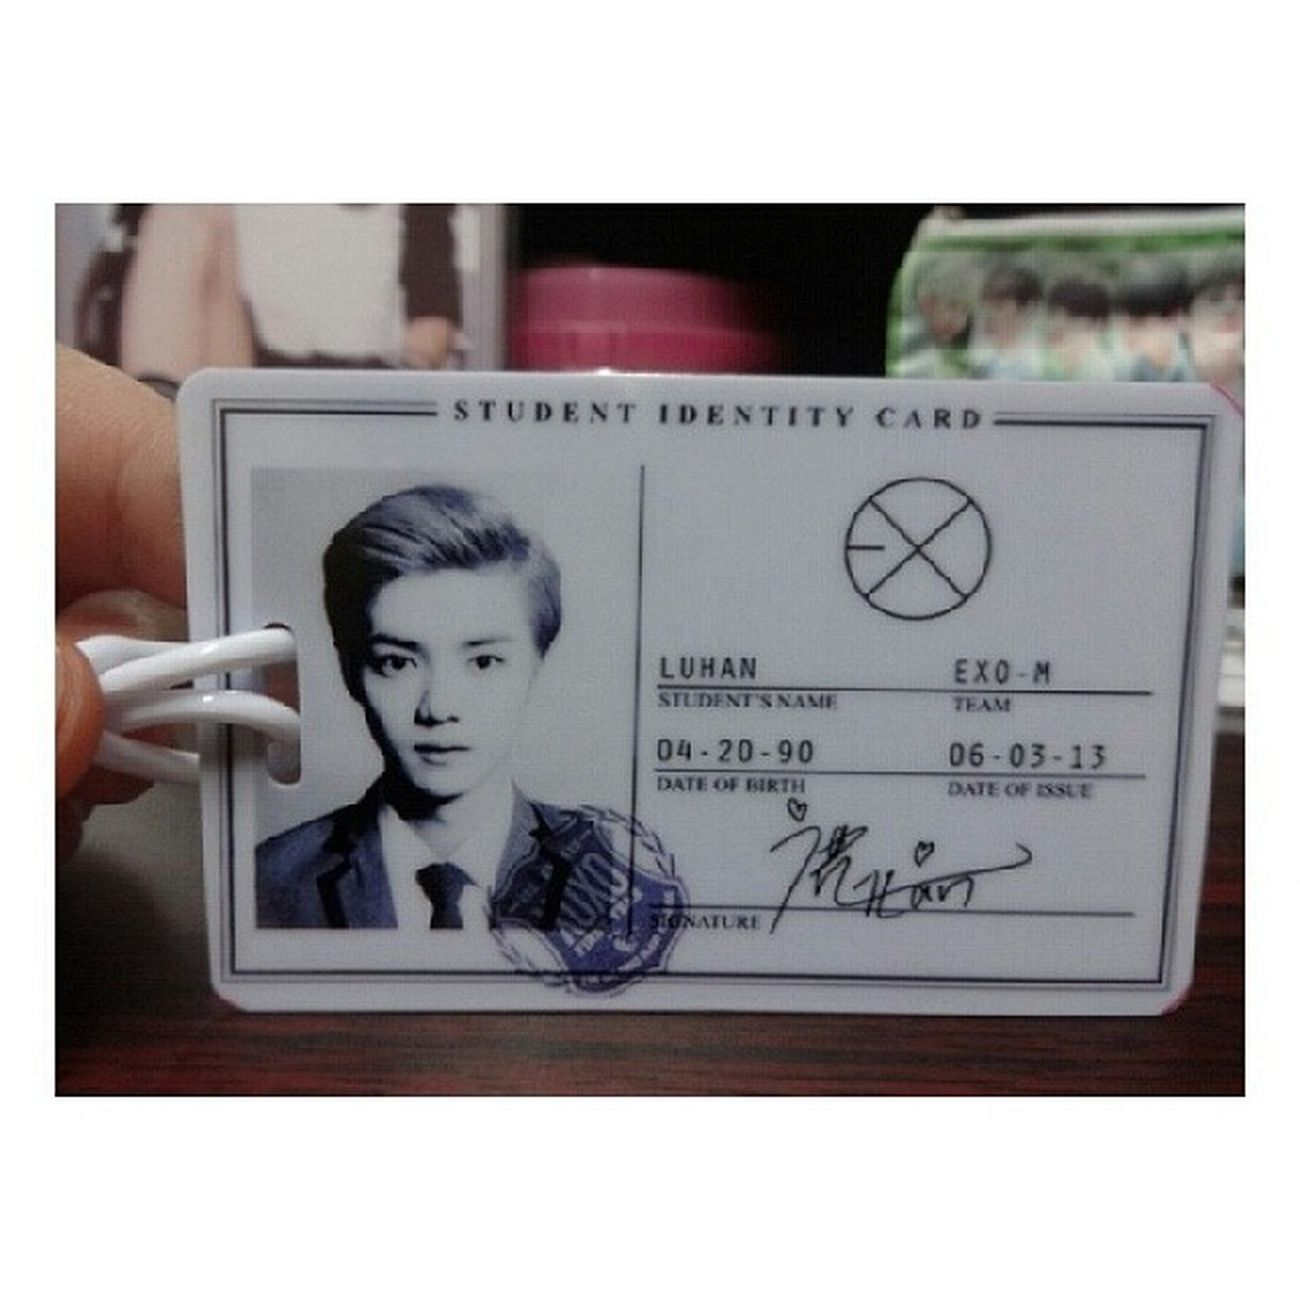 My BagtG Luhan ❤ BagTag Luhan Cute Xoxo Kpopmerch ♡